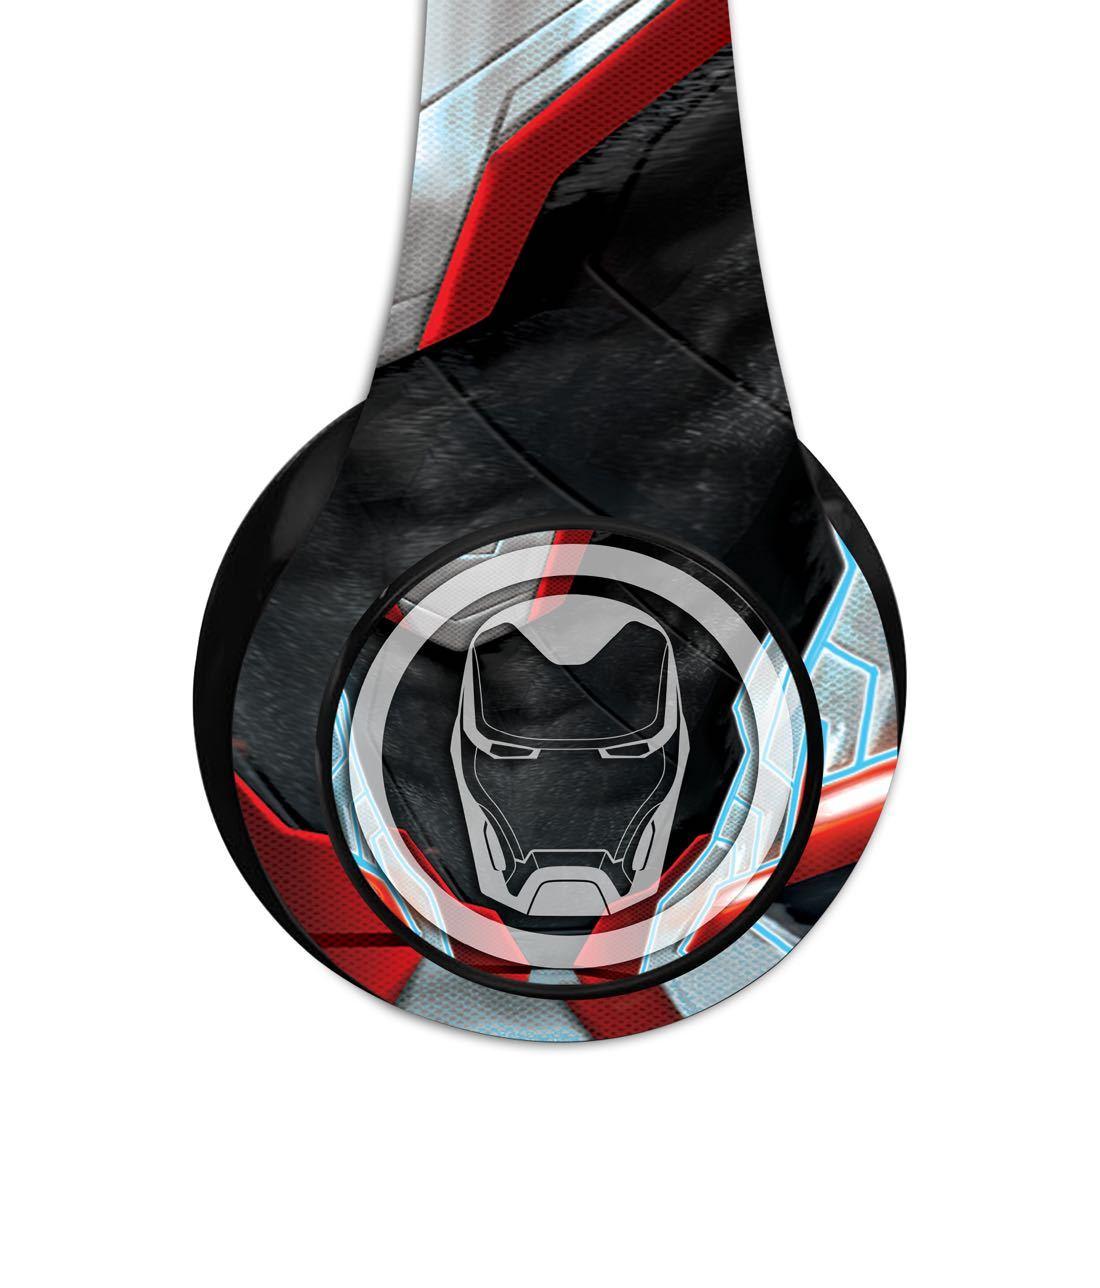 Endgame Suit Ironman - Decibel Wireless On Ear Headphones